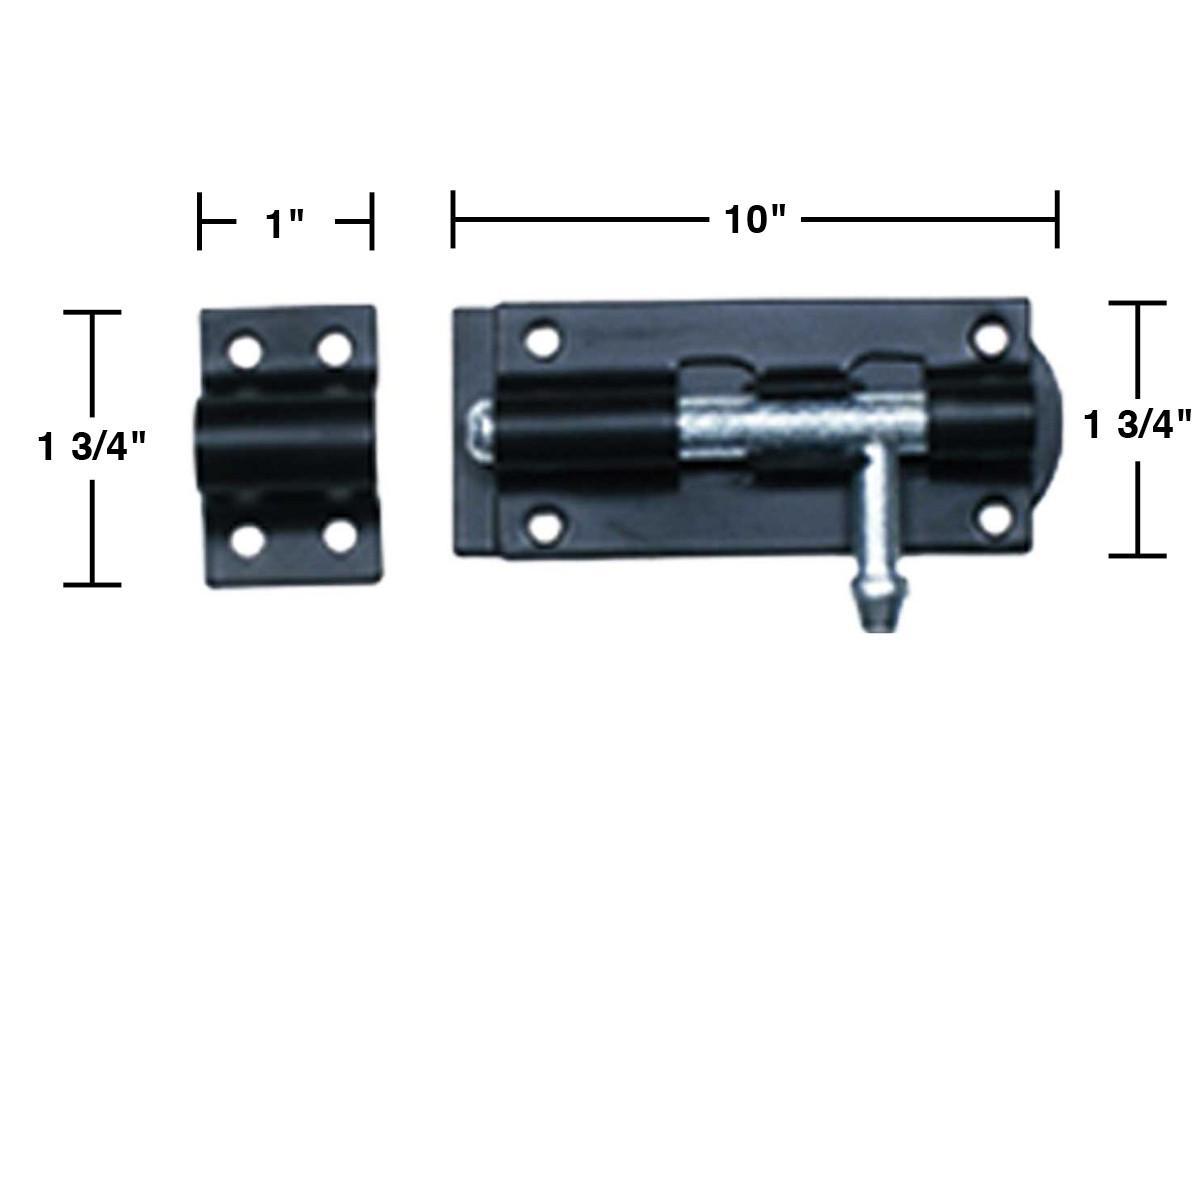 Black Wrought Iron Tower Door Bolt 10 | Renovators Supply 3